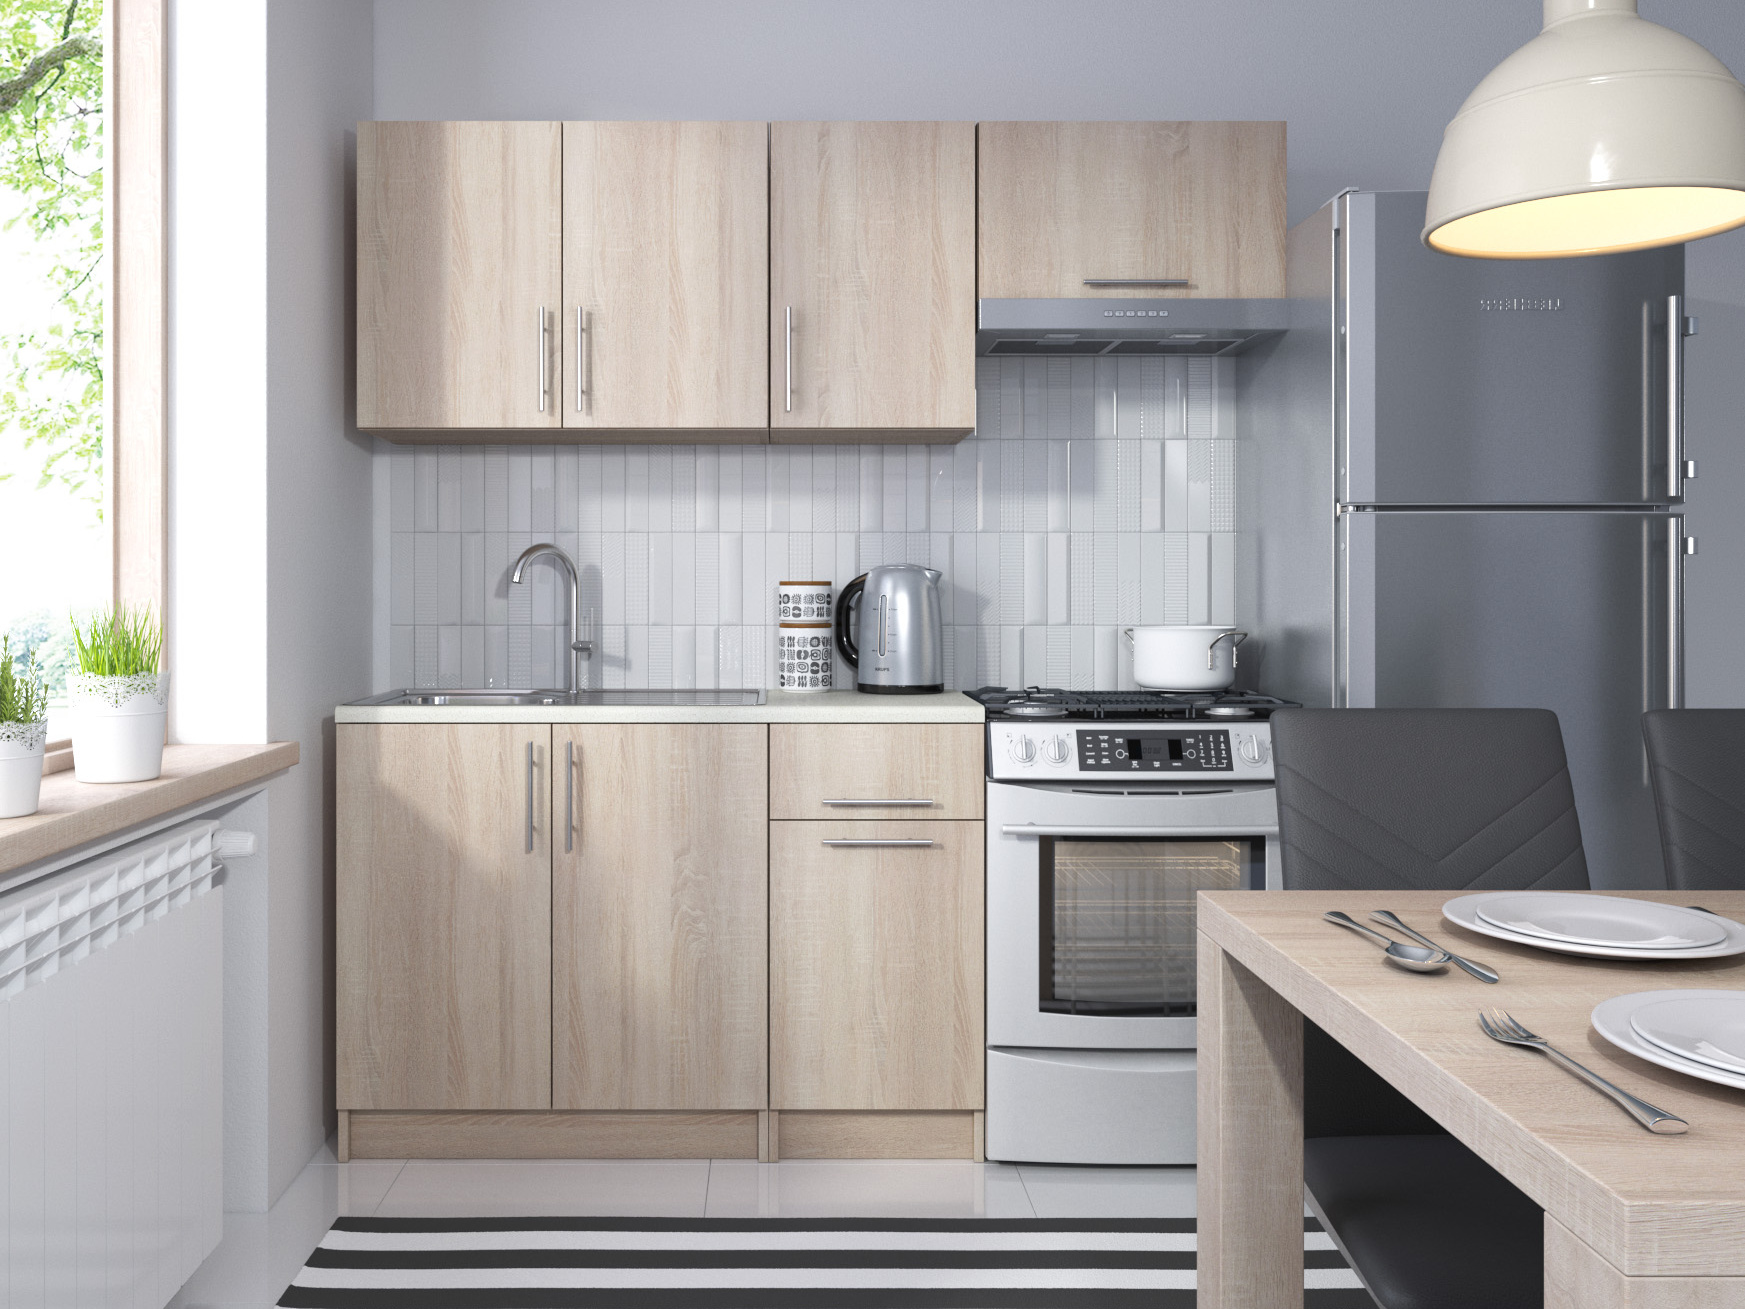 Kuchyně NEJBY 120/180 cm, dub sonoma